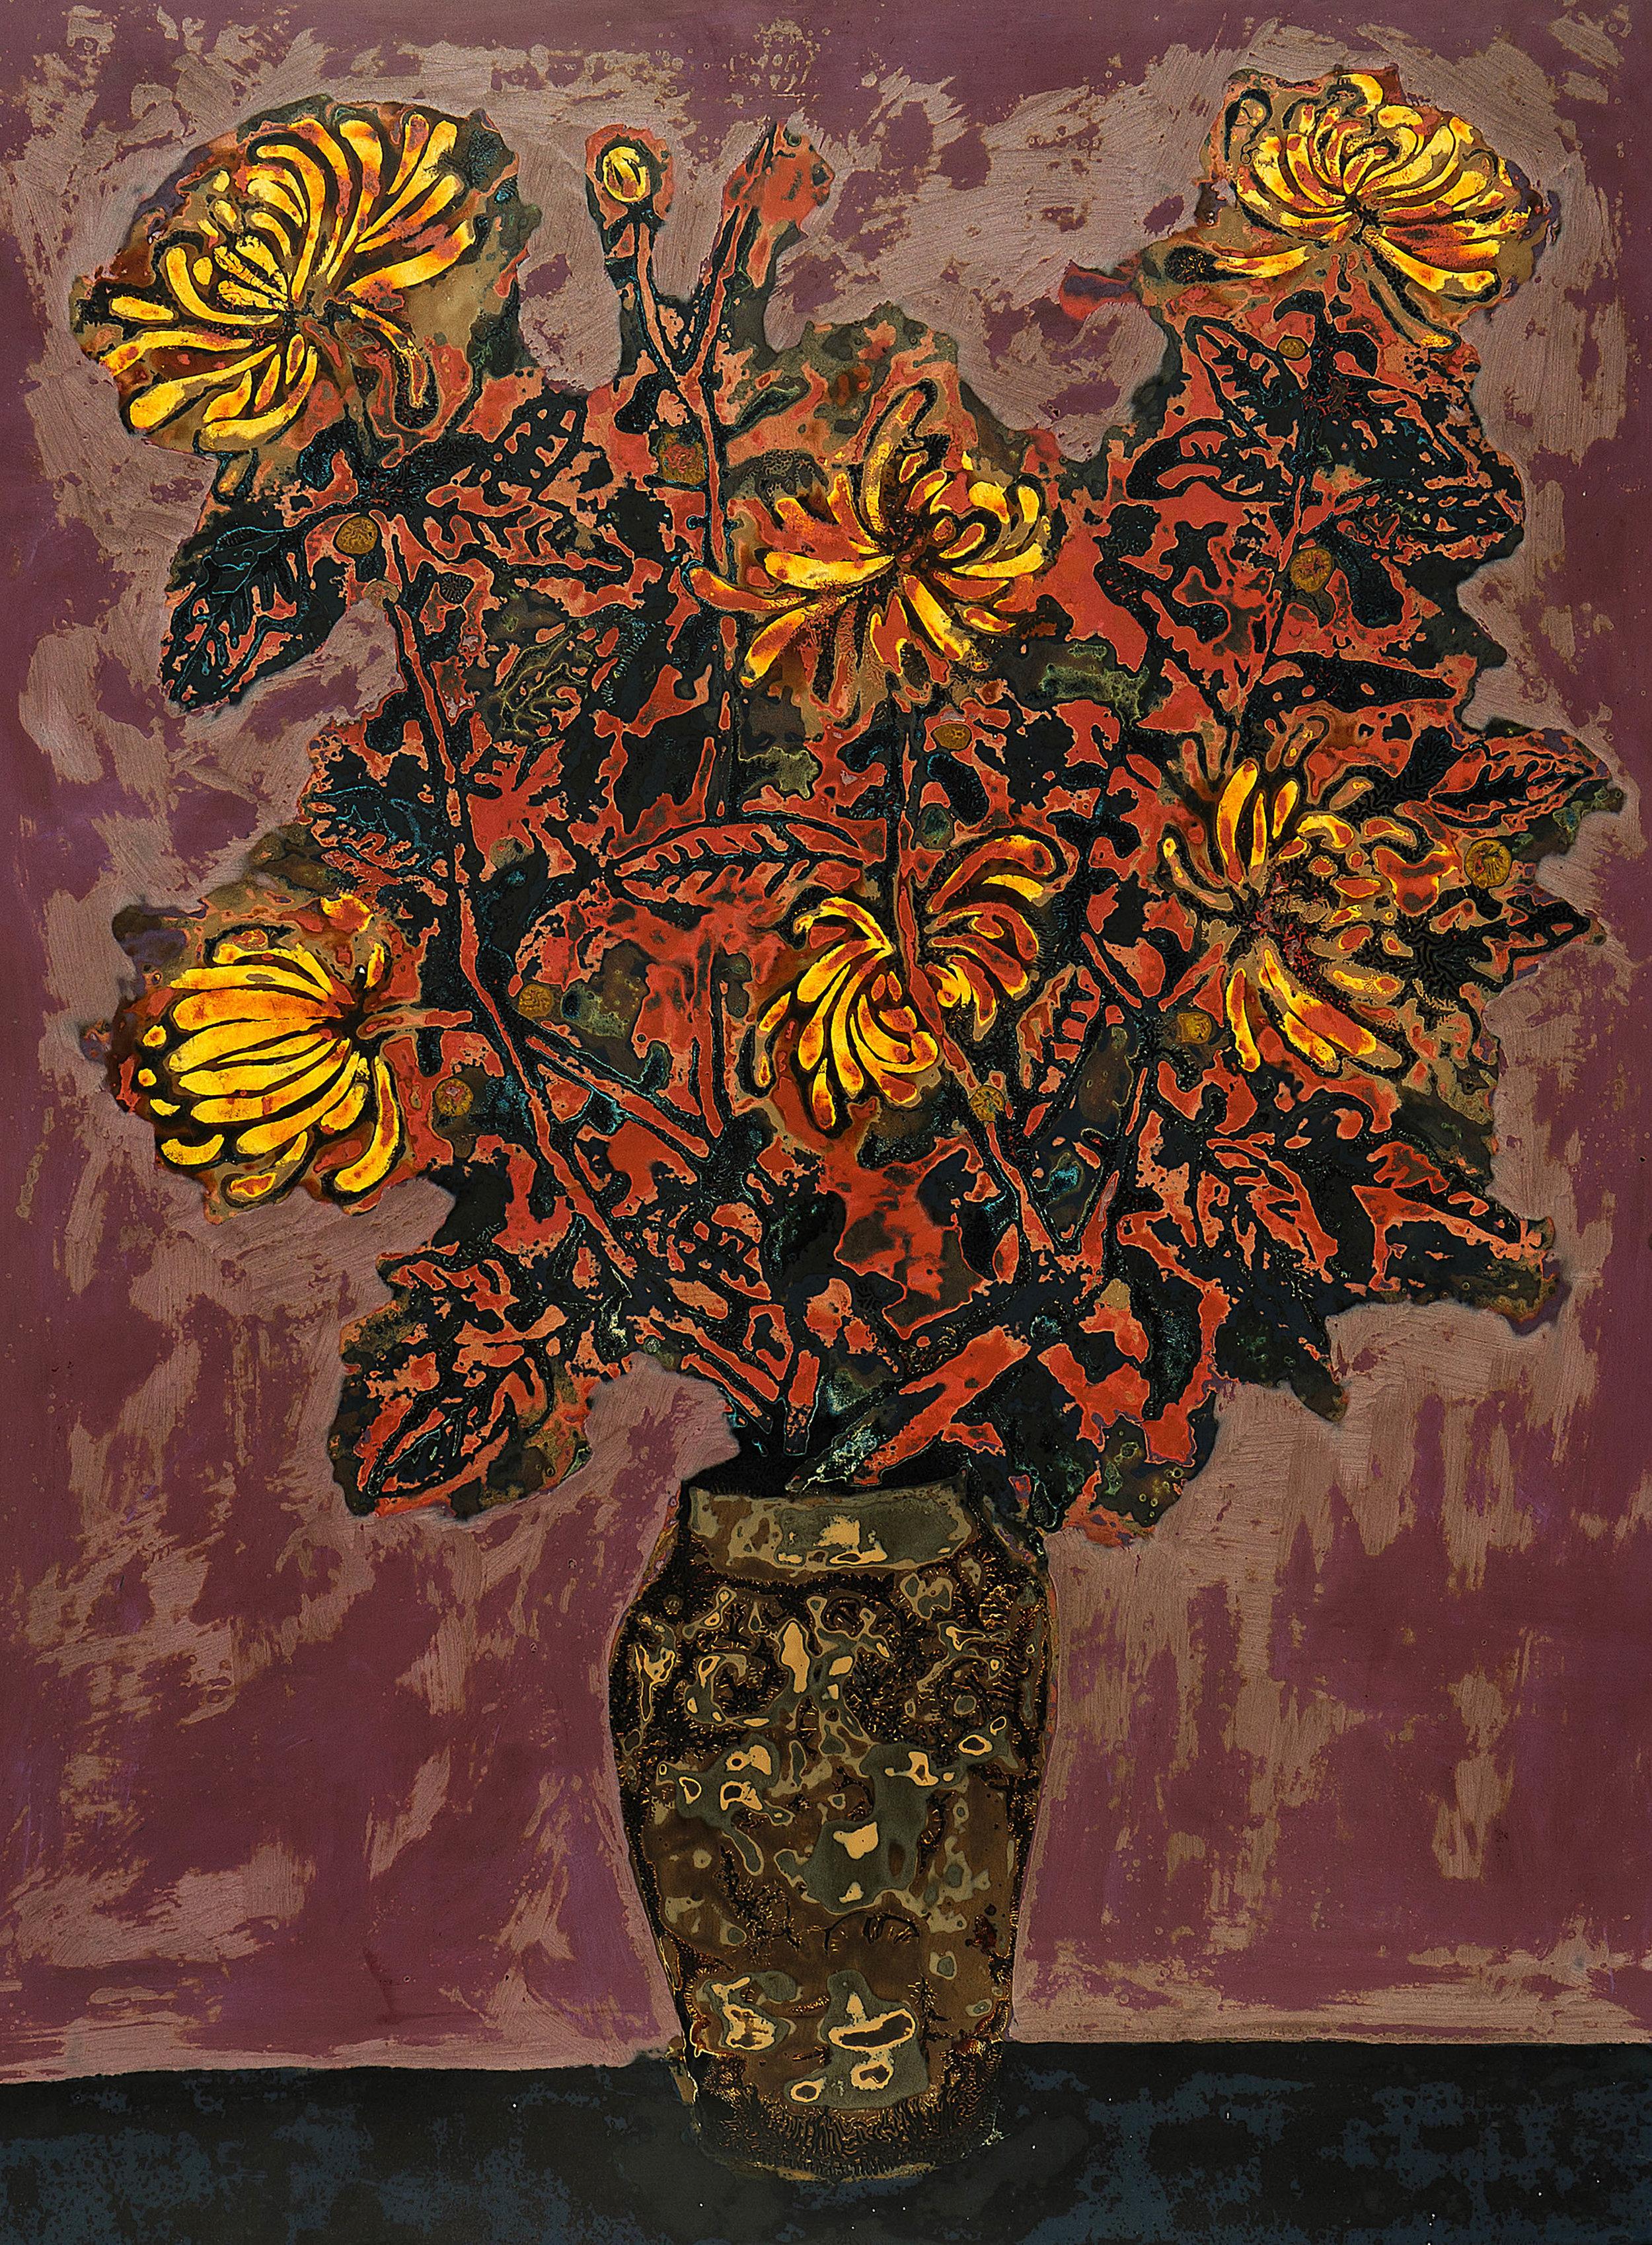 Chrysanthemum , 2016, Lacquer on wood panel, 80 x 60 cm